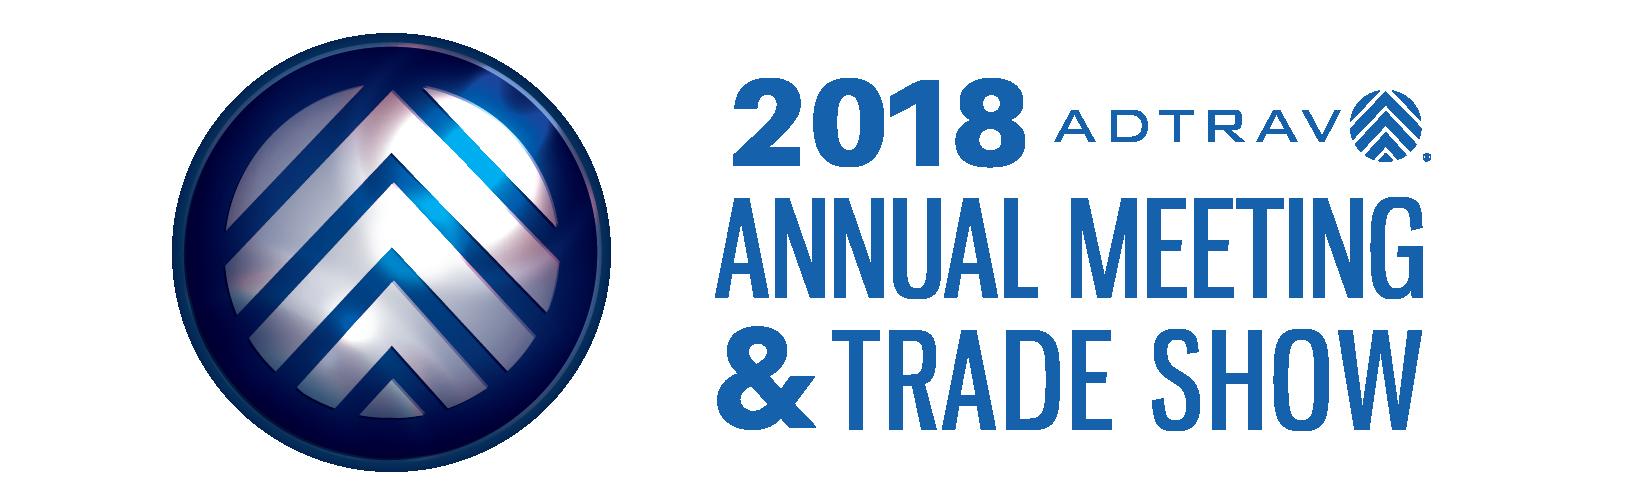 ADTRAV 2018 Annual Meeting & Trade Show